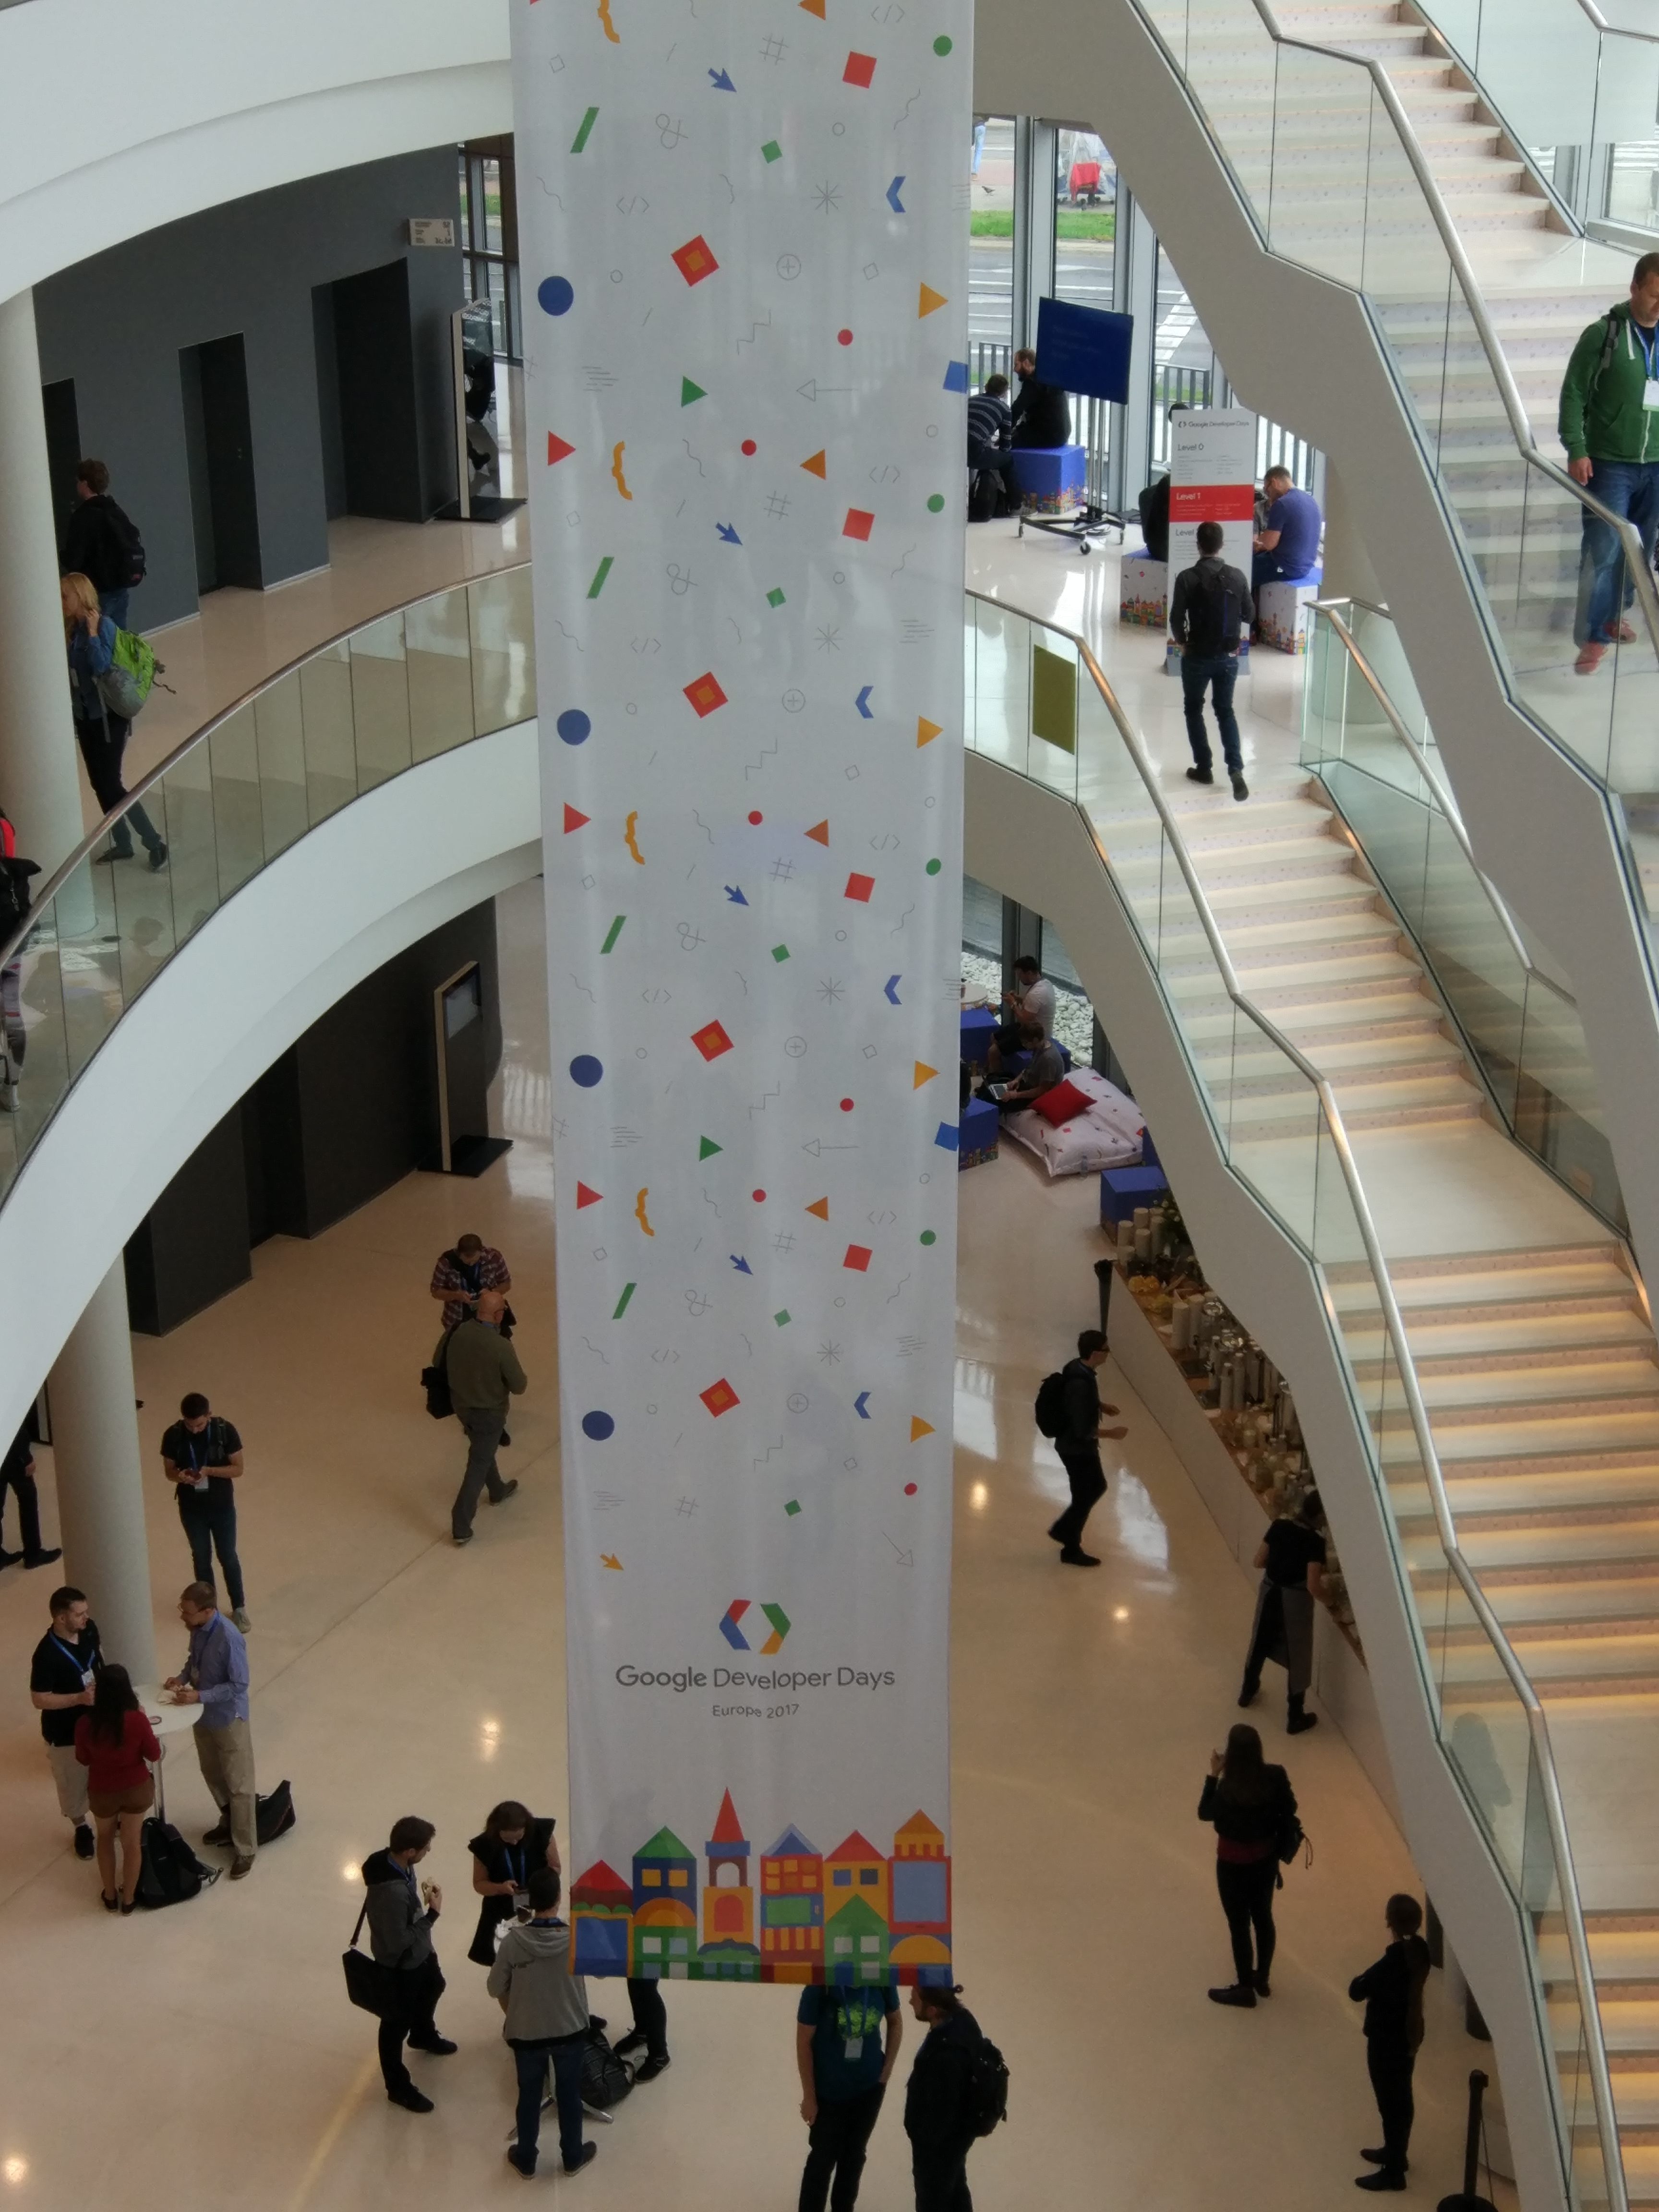 Webové technológie, machine learning či augmented reality: ako bolo na Google Developer Days v Krakowe?